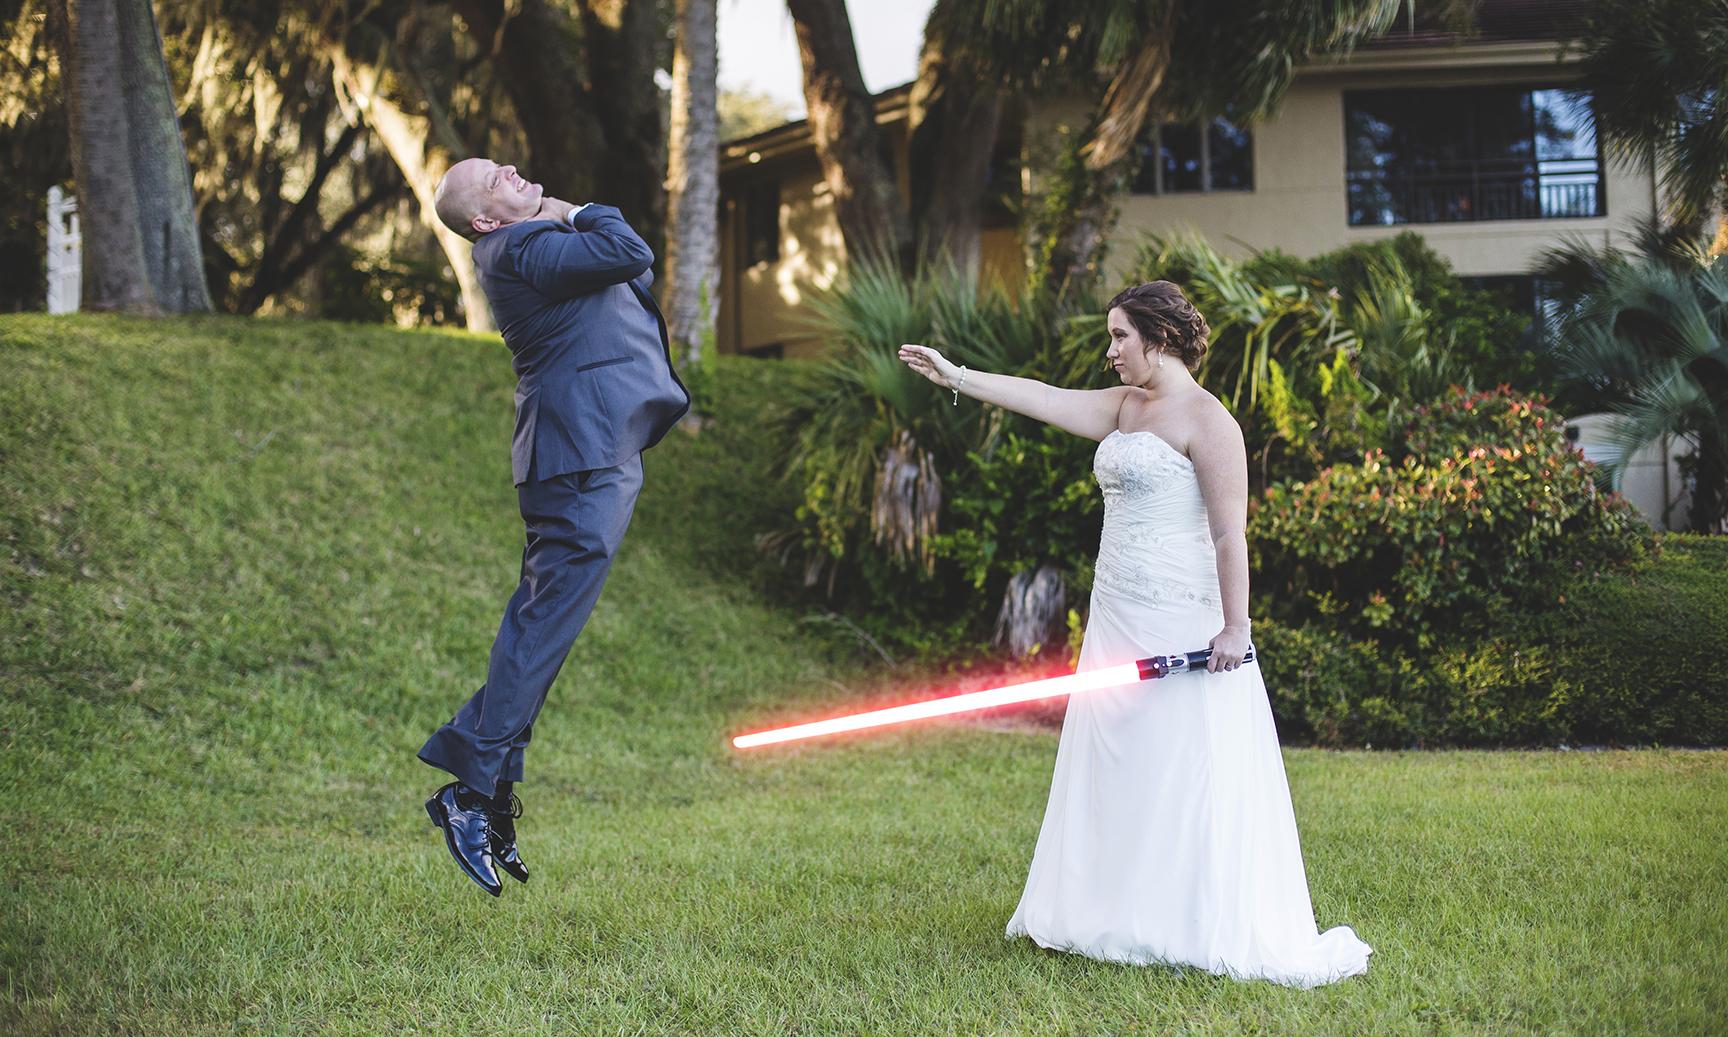 adam-szarmack-wedding-photographer-awesome-2.jpg